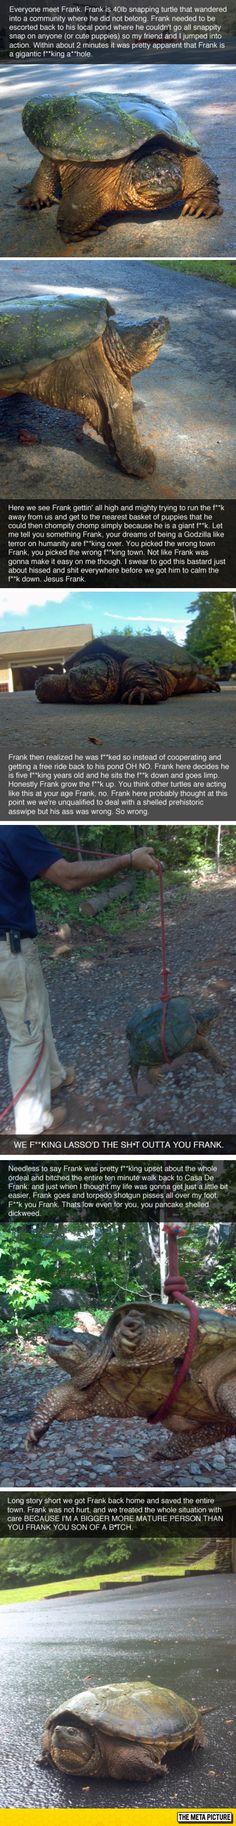 Meet Frank The Turtle